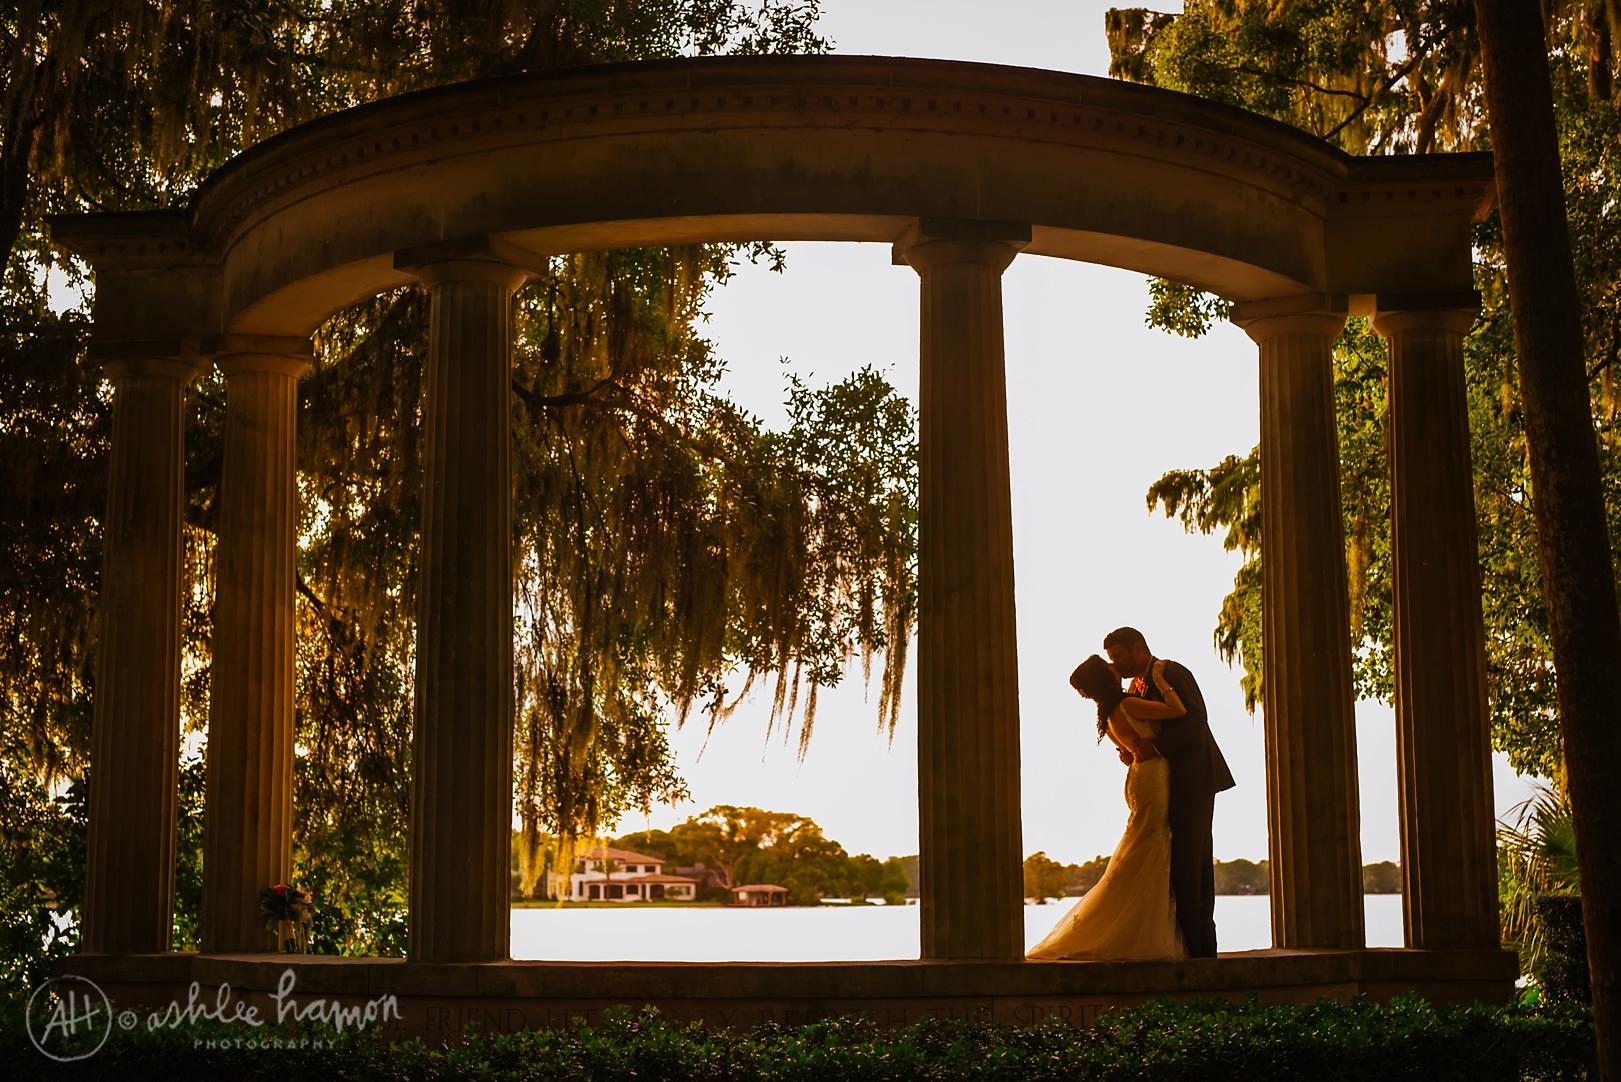 kraft-azalea-gardens-stylish-elopment-wedding-photography_0022.jpg